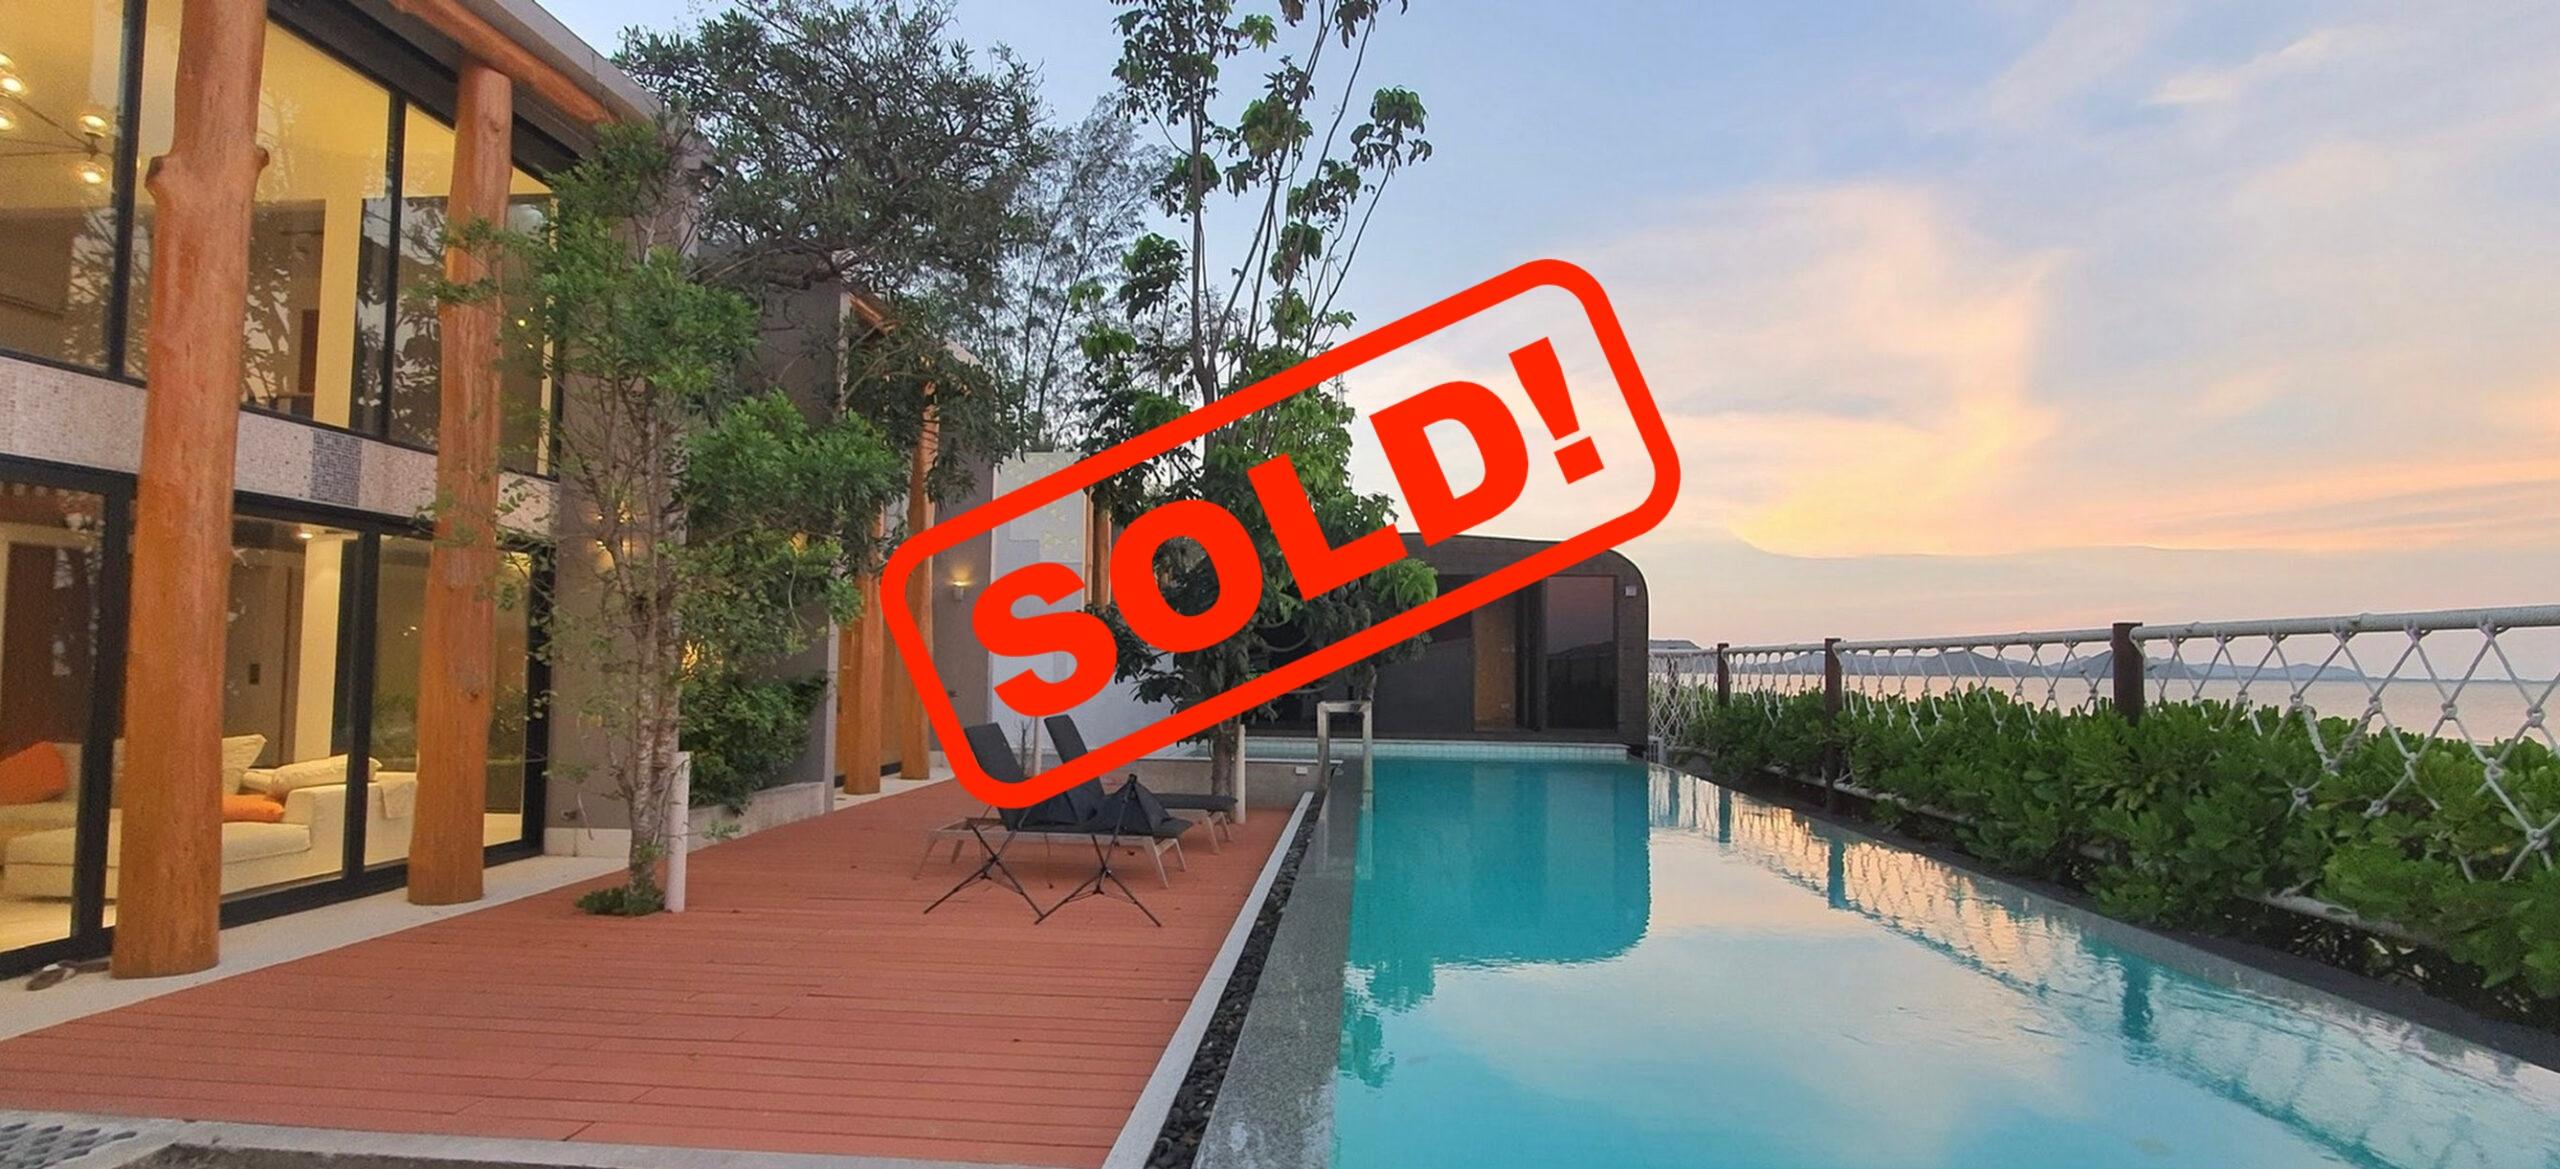 SOLD!! ขายบ้านติดทะเลสามร้อยยอด Beachfront For Sale @Samroiyod